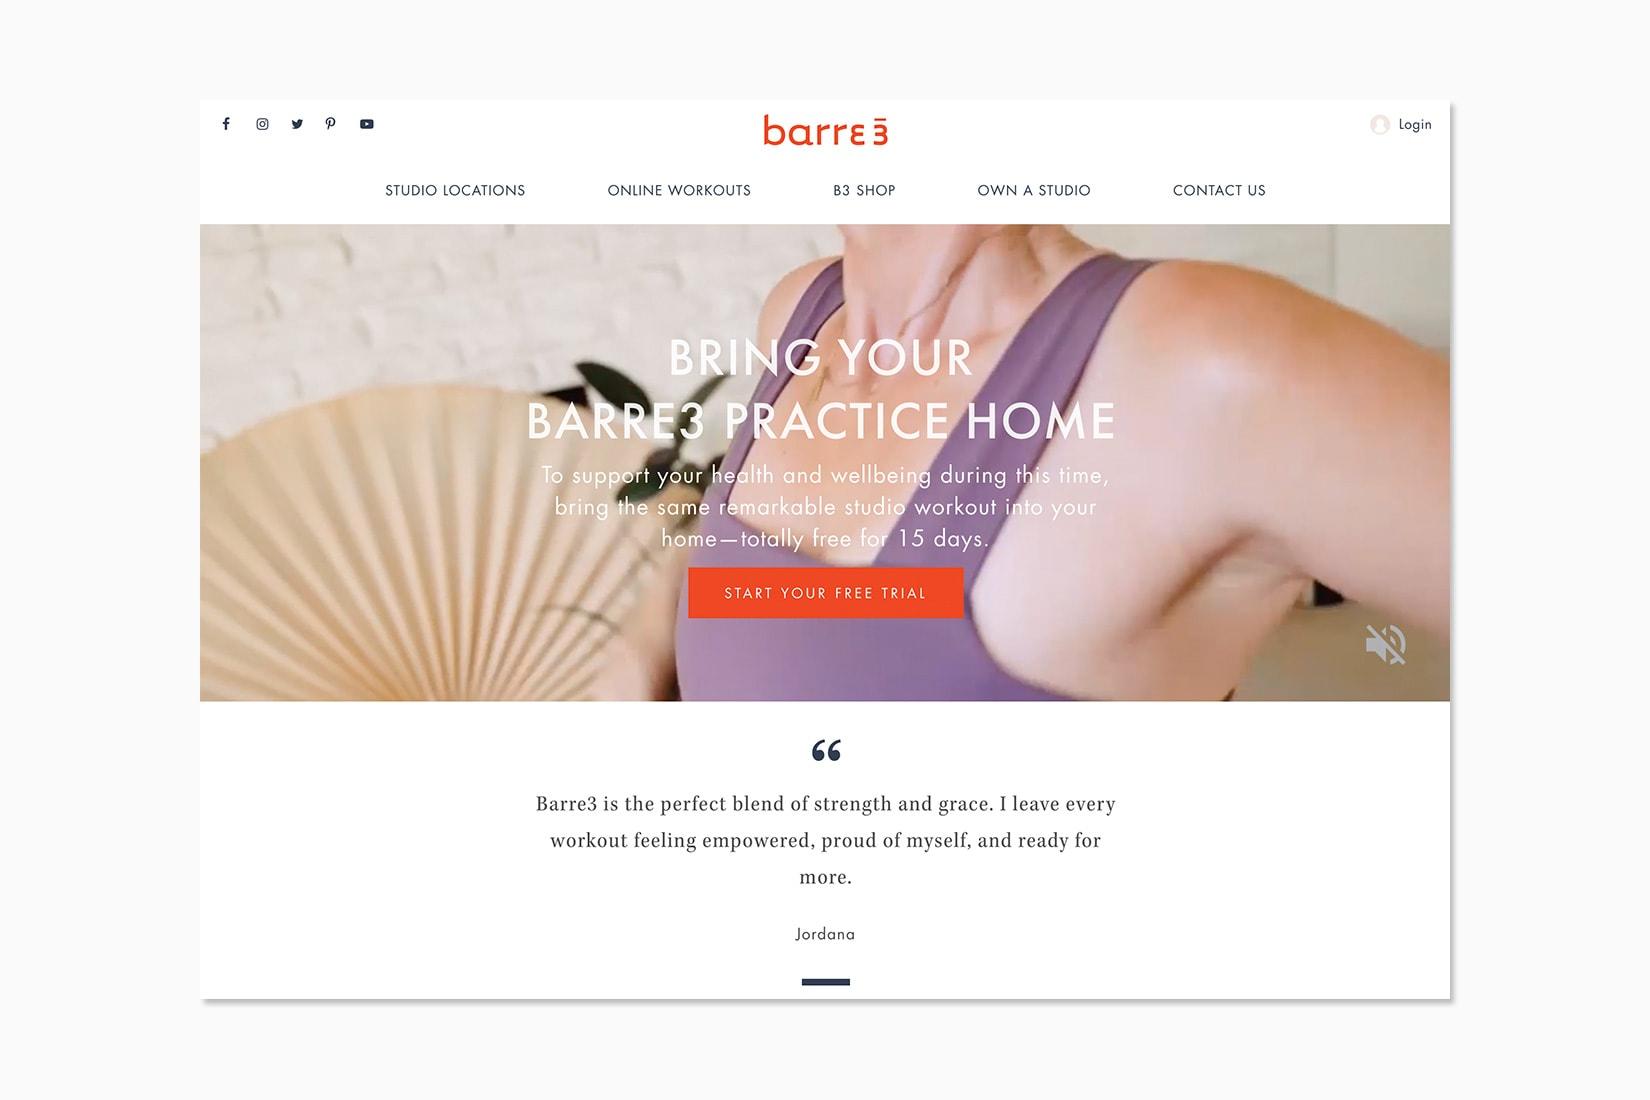 best online workout program barre3 review - Luxe Digital